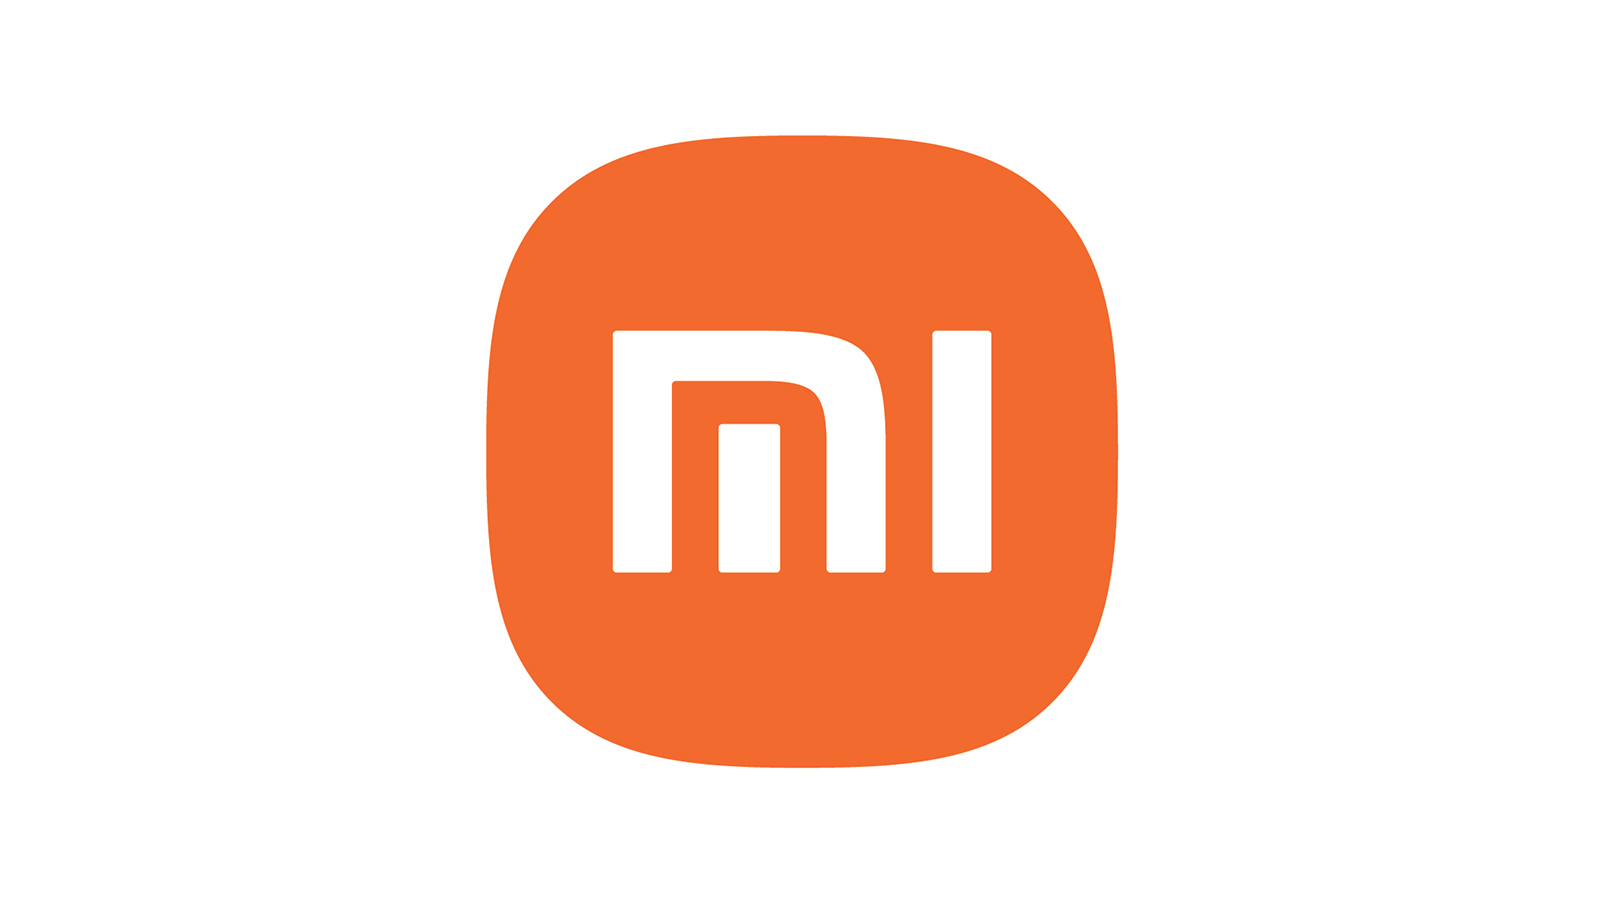 H Xiaomi βγαίνει από τη μαύρη λίστα των ΗΠΑ